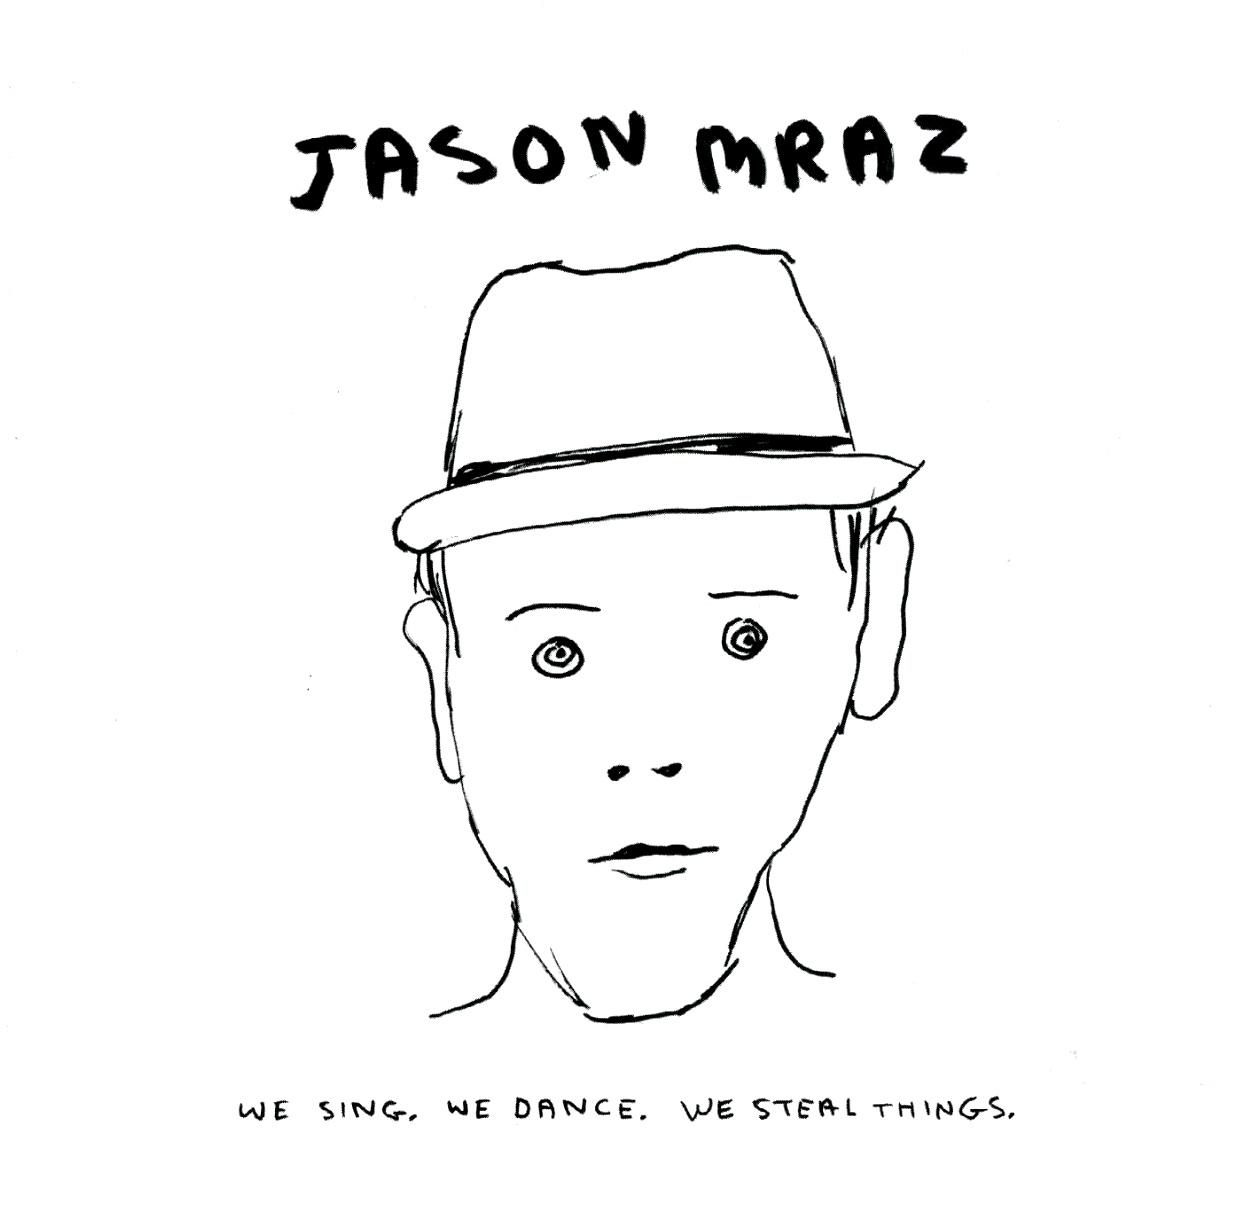 Jason Mraz: We Sing. We Dance. We Steal Things. (MP3 Digital Album)  Free